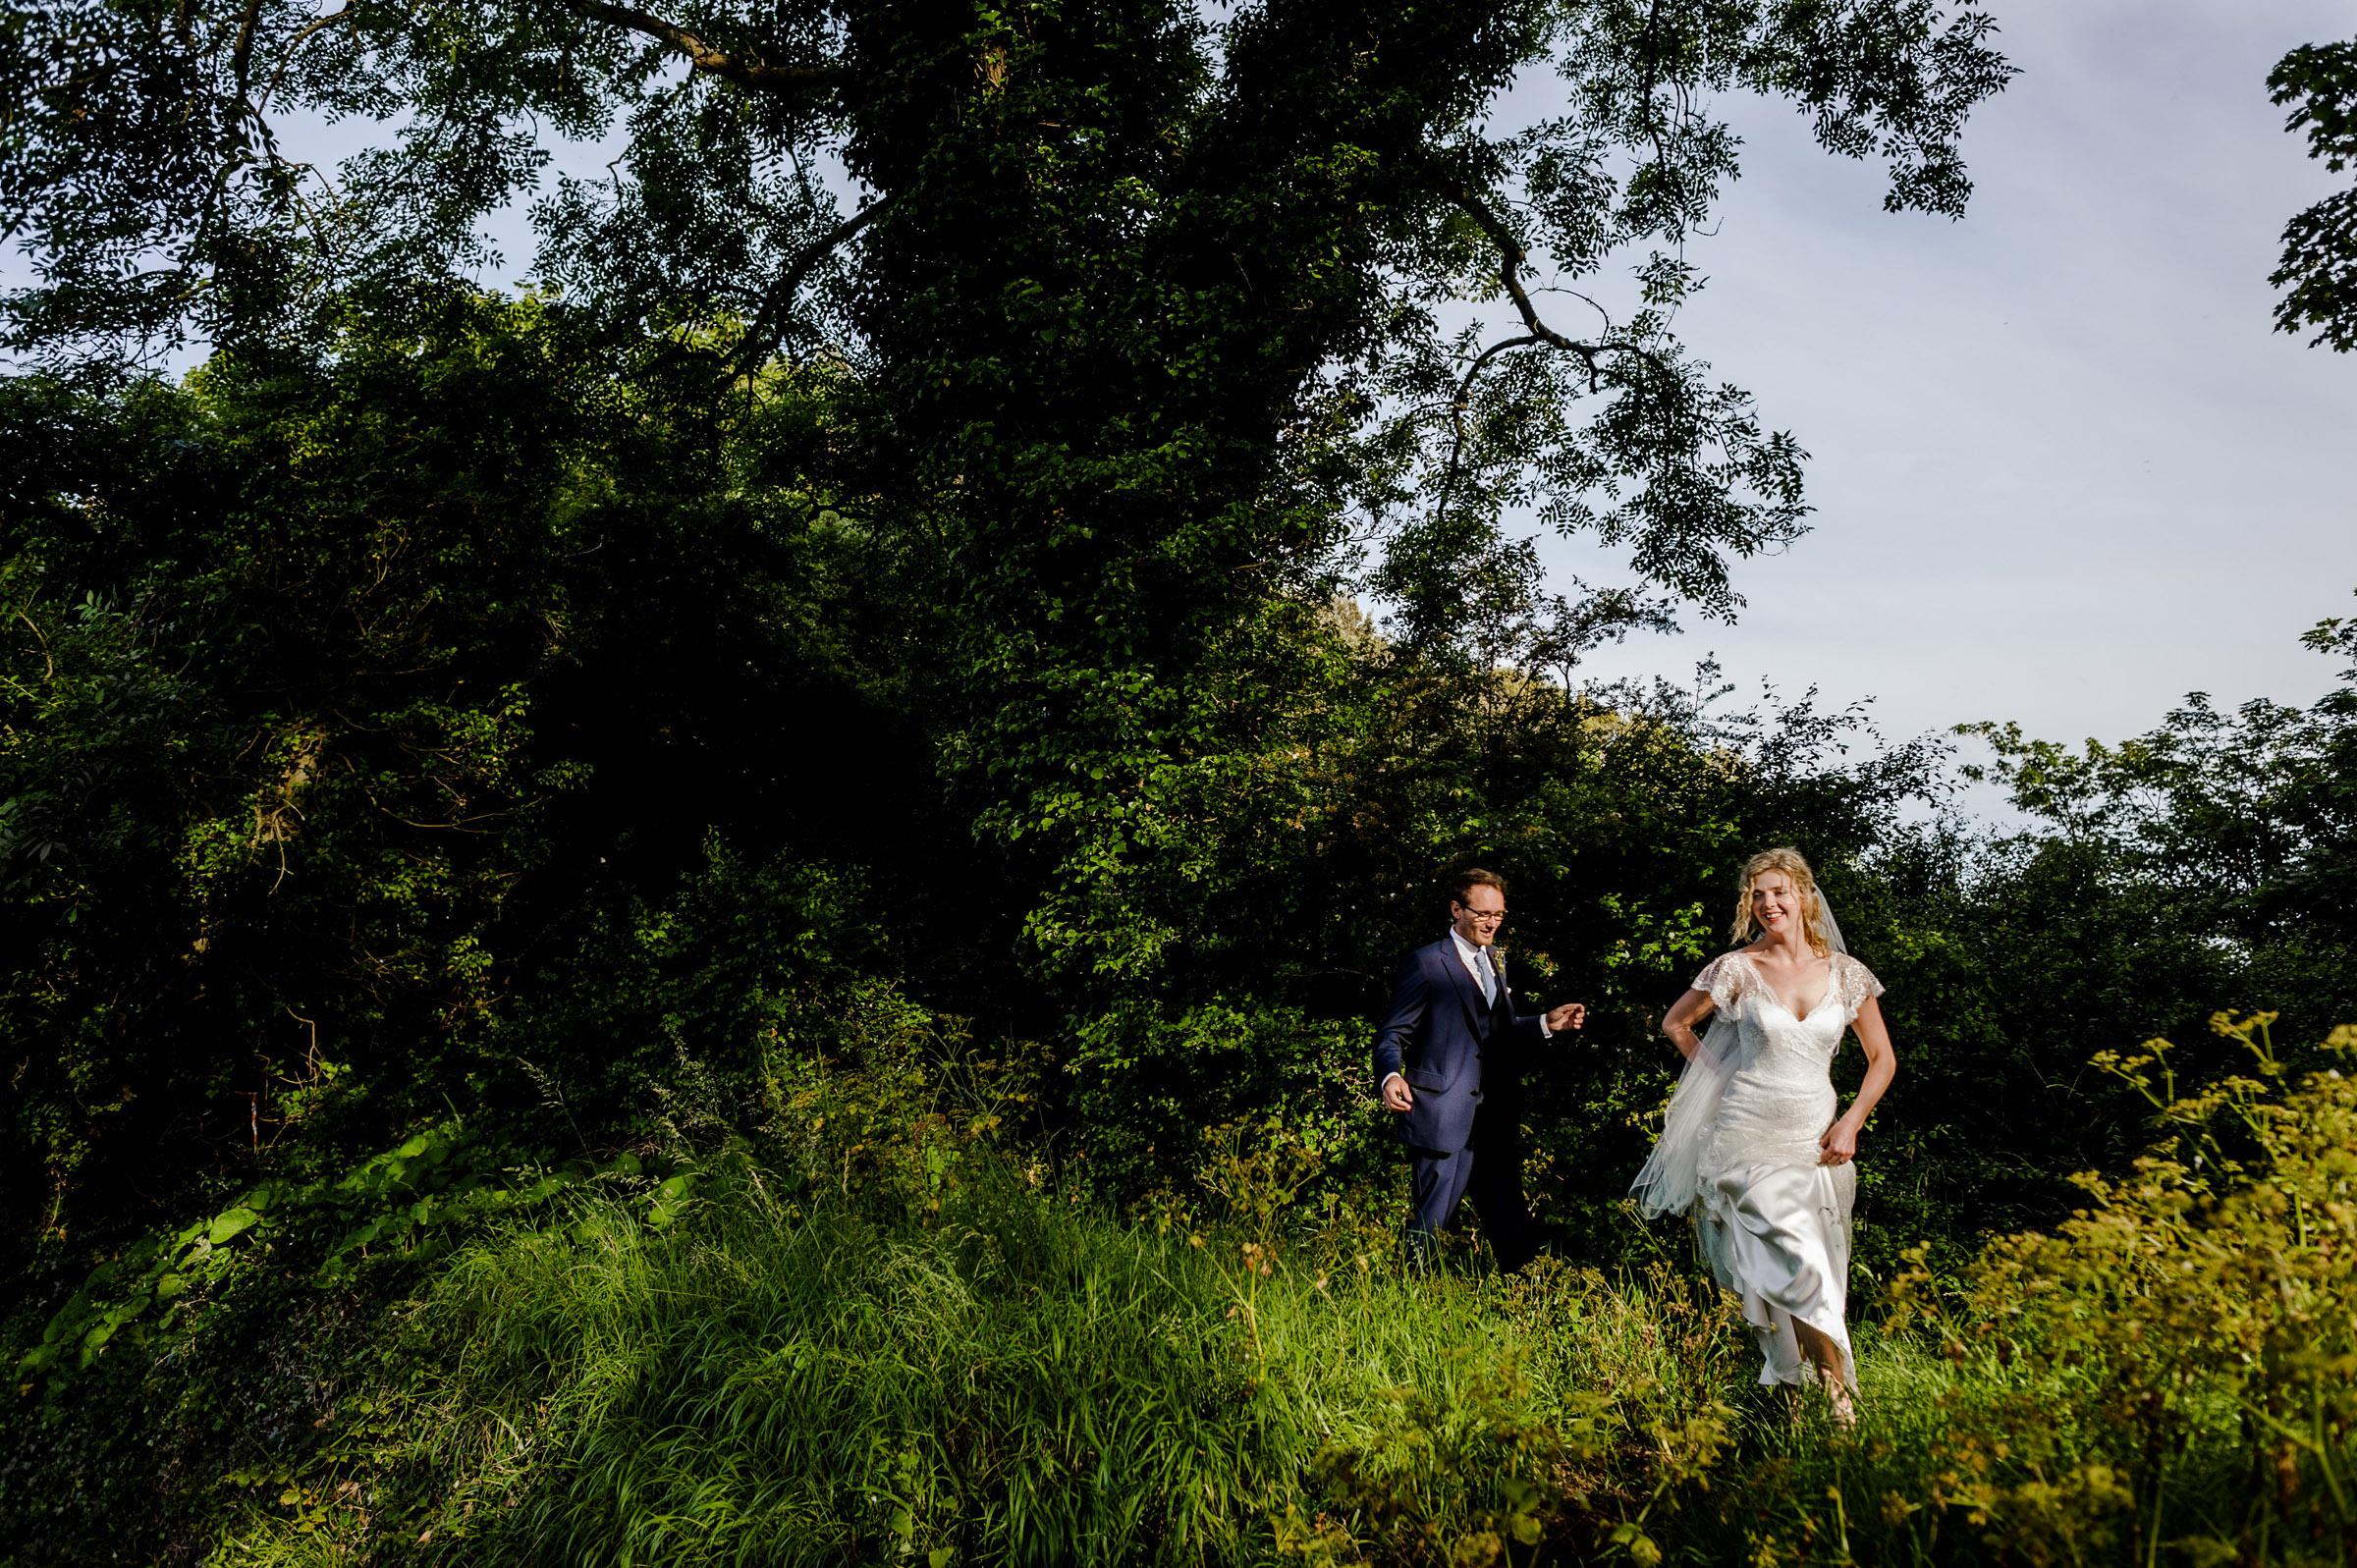 Documentary Wedding Photography in Devon 036.jpg